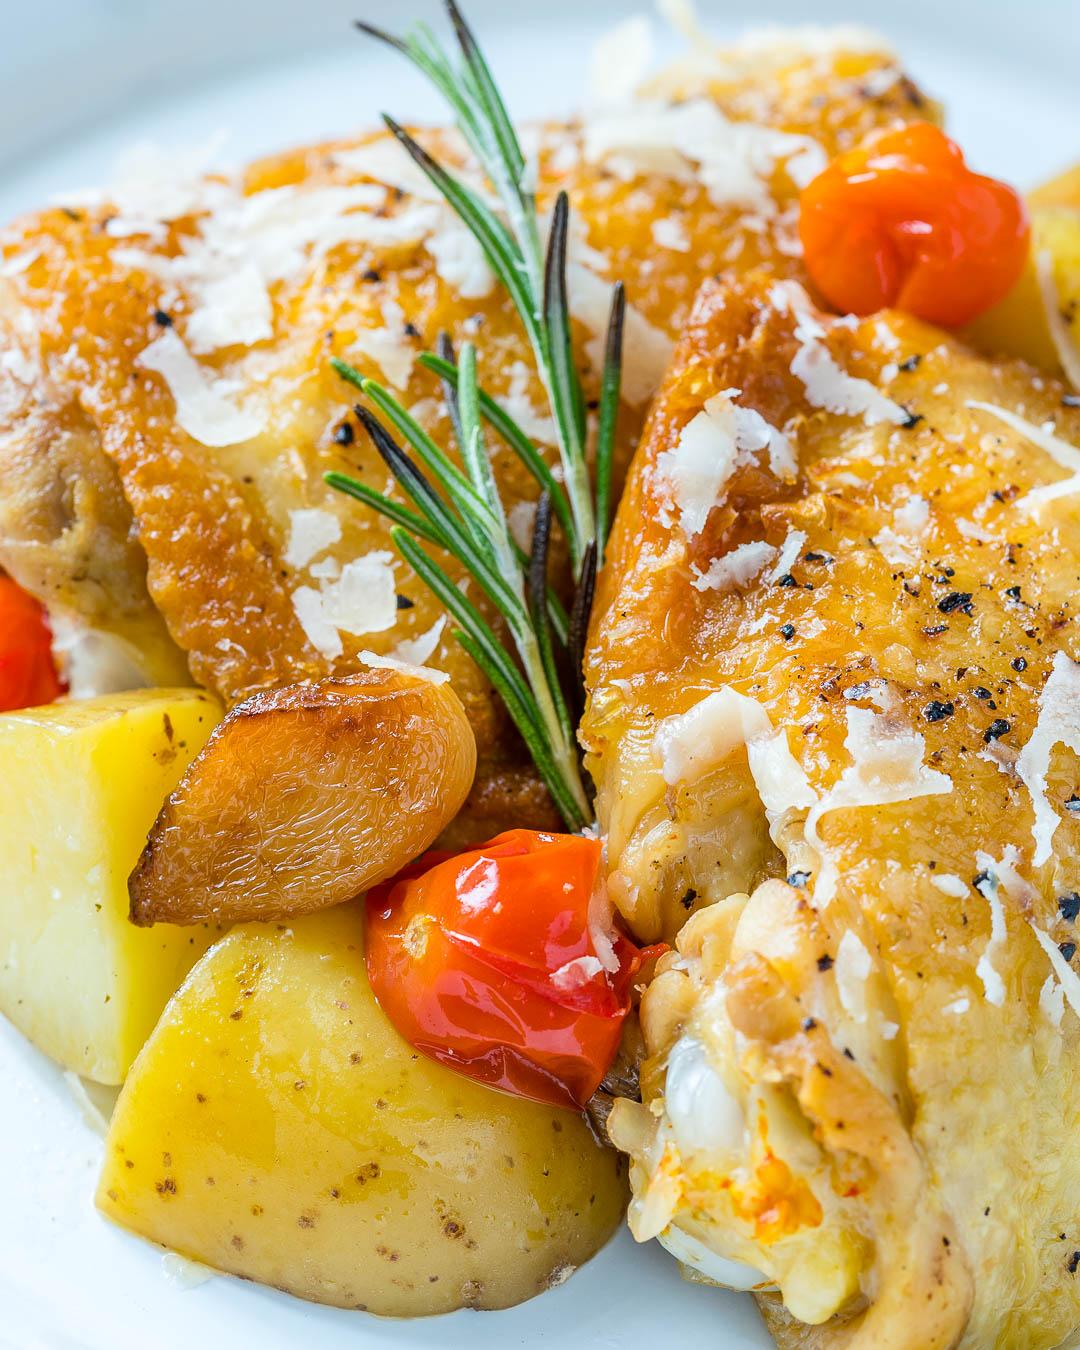 Slow Cooker Garlic Parmesan Chicken Clean Eating Dinner